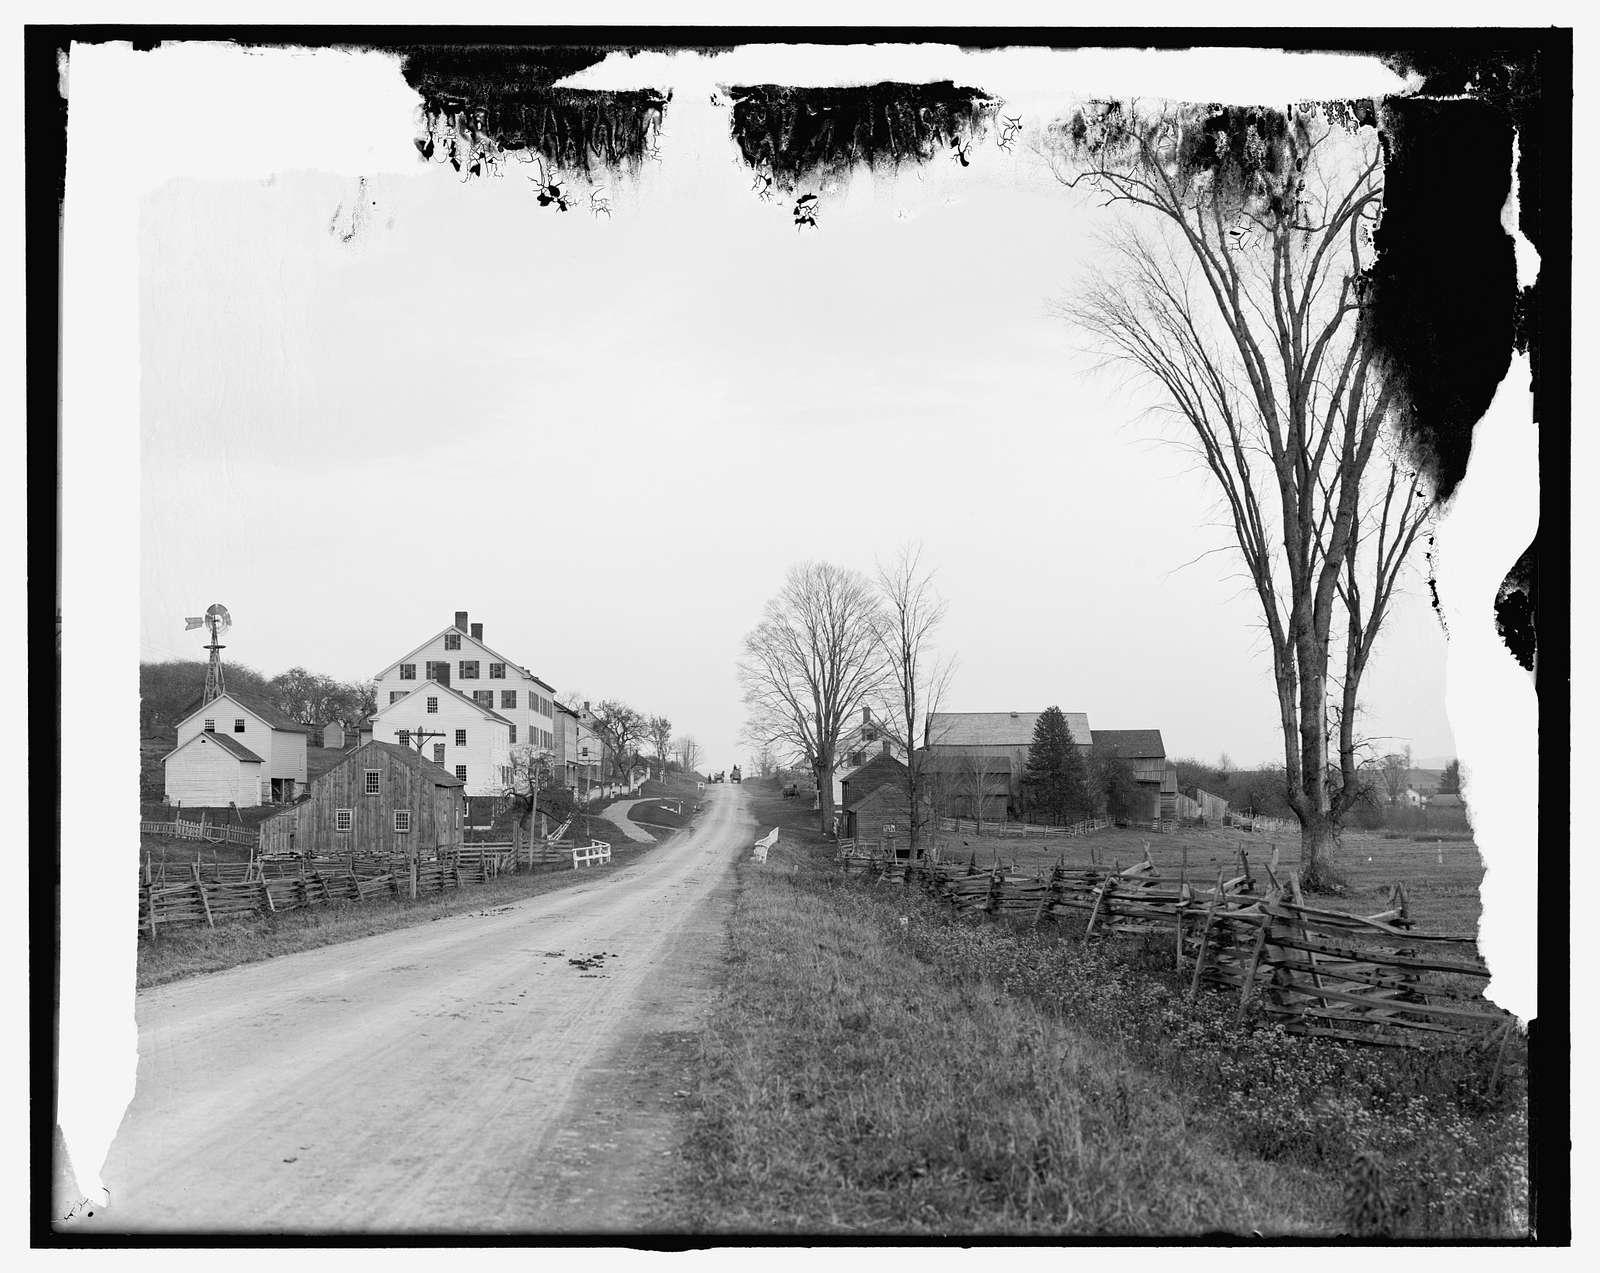 Shaker Town Road, Pittsfield, Mass.